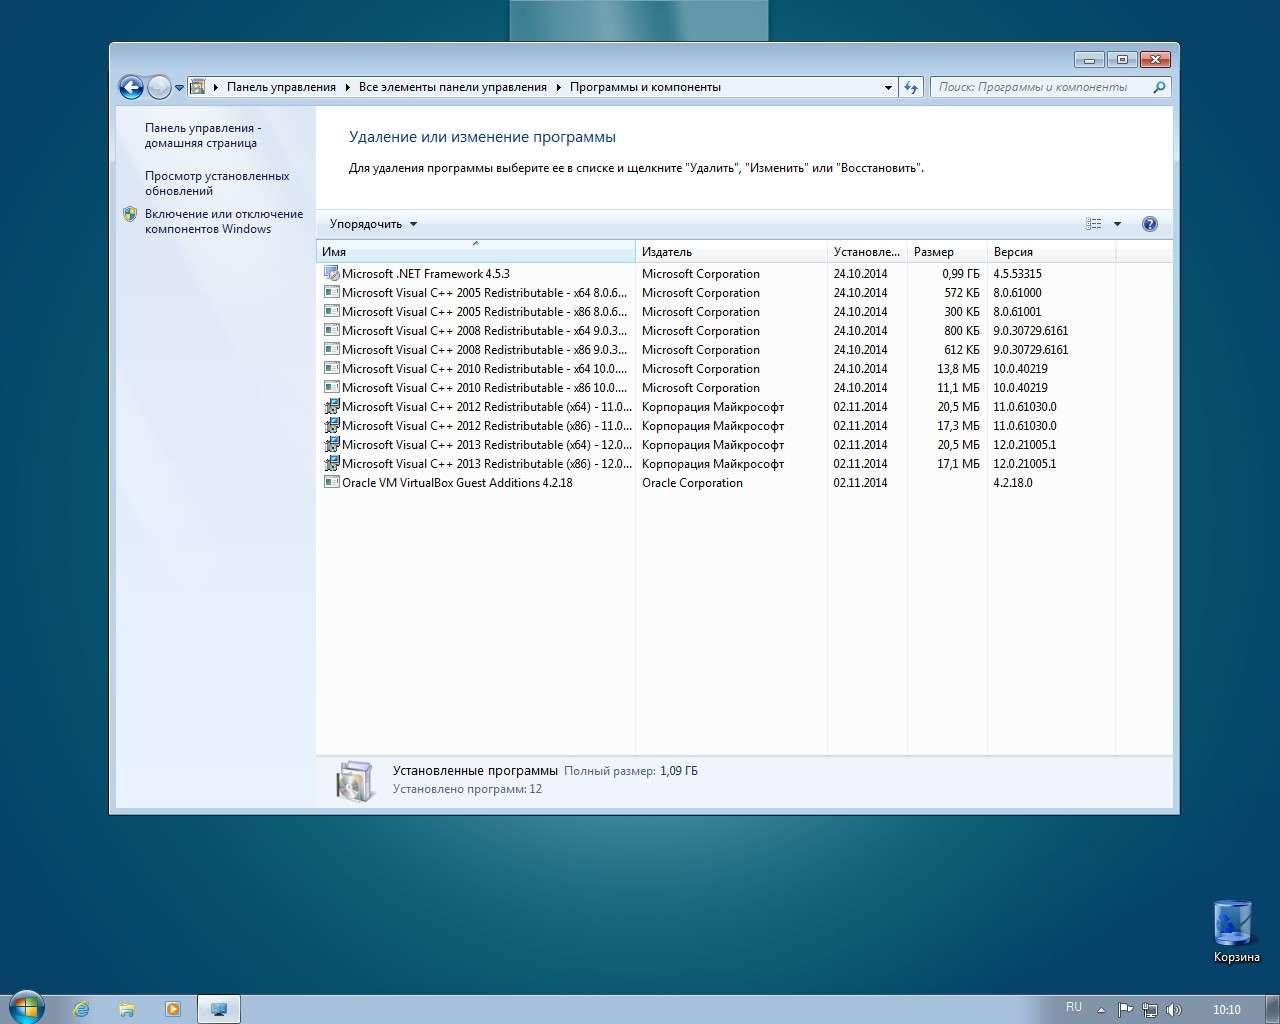 Windows 7 Ultimate SP1 2in1 x86/x64 v.25.10.14 by EmiN 27.10.2014 RUS